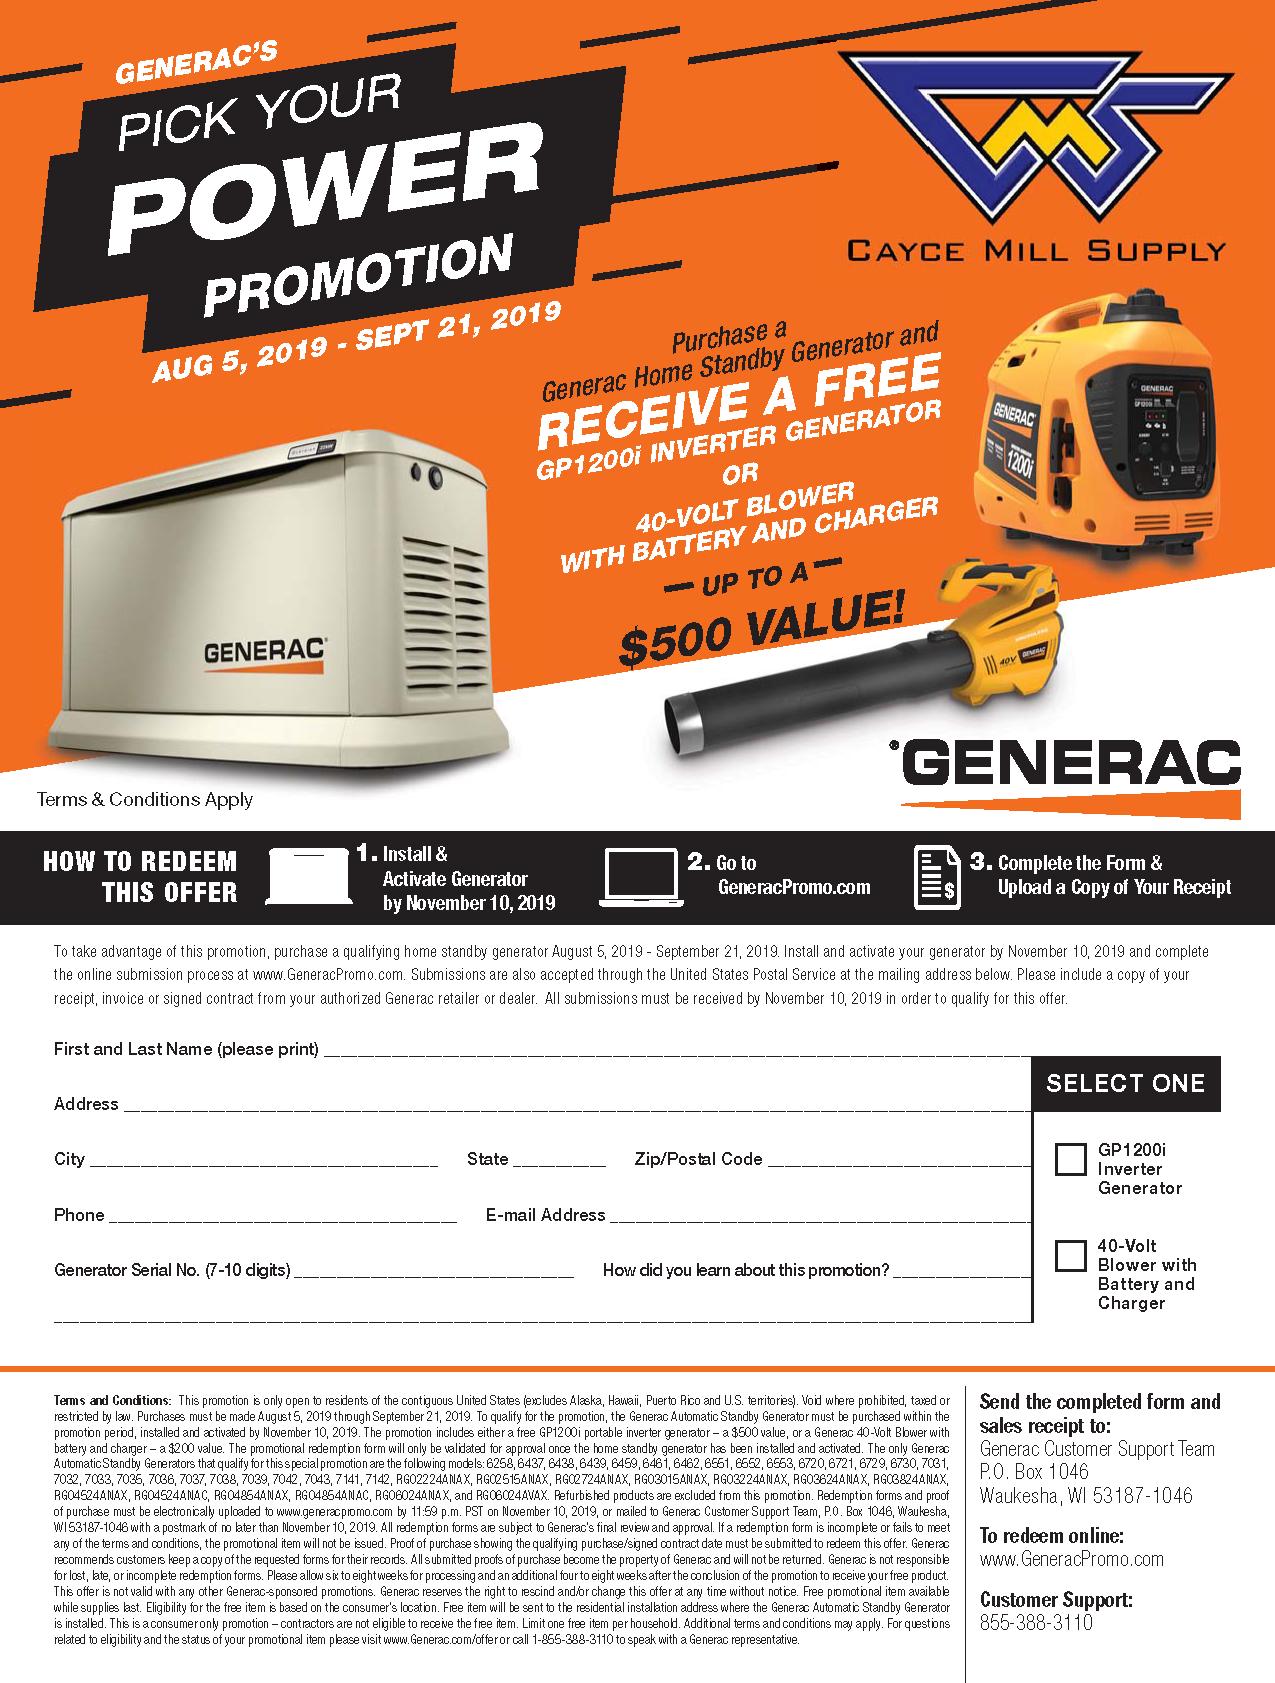 Generac's Pick Your Power Promo